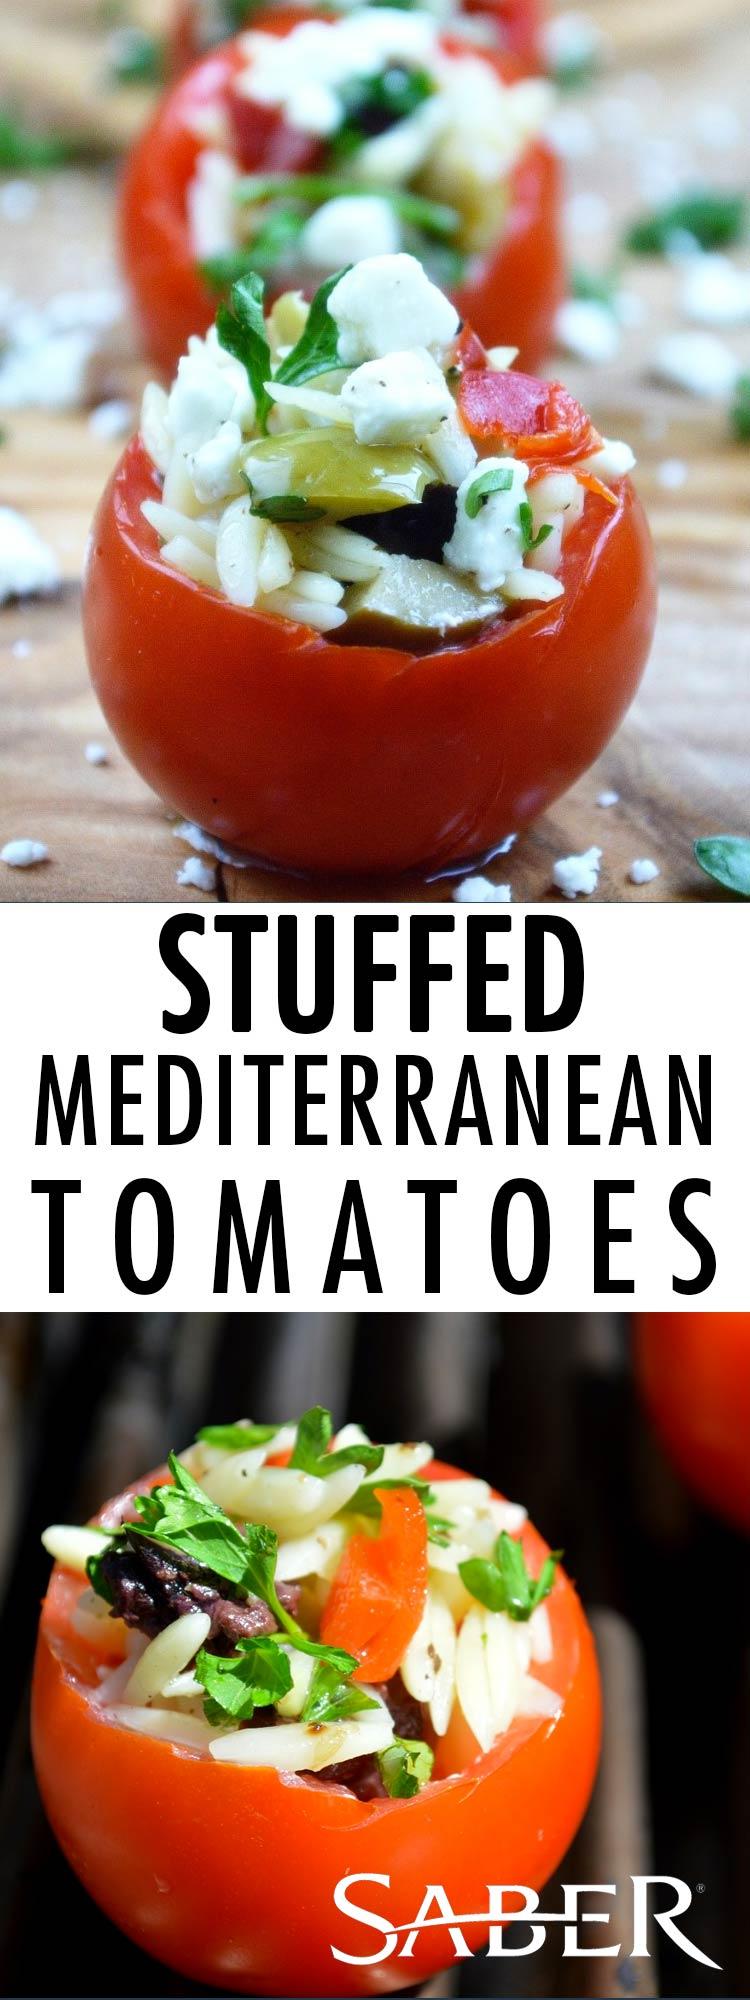 stuffed mediterranean tomatoes